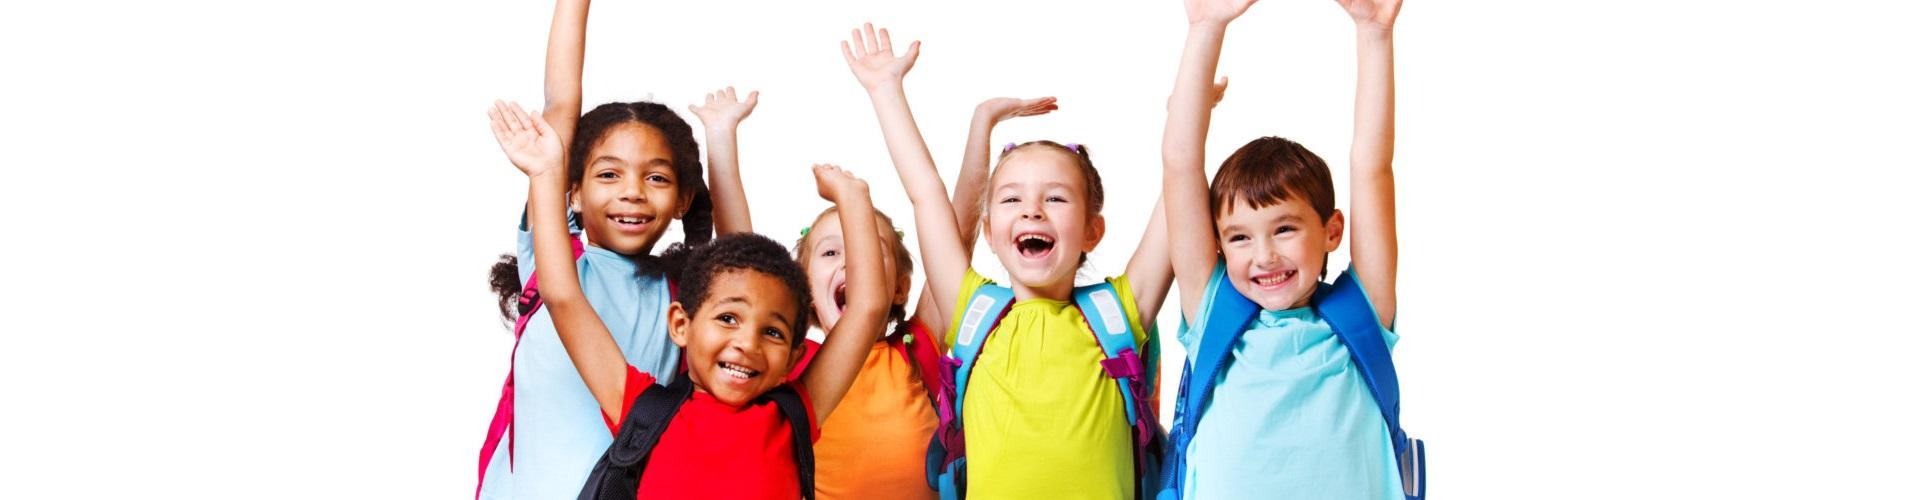 happy kids raising their hands